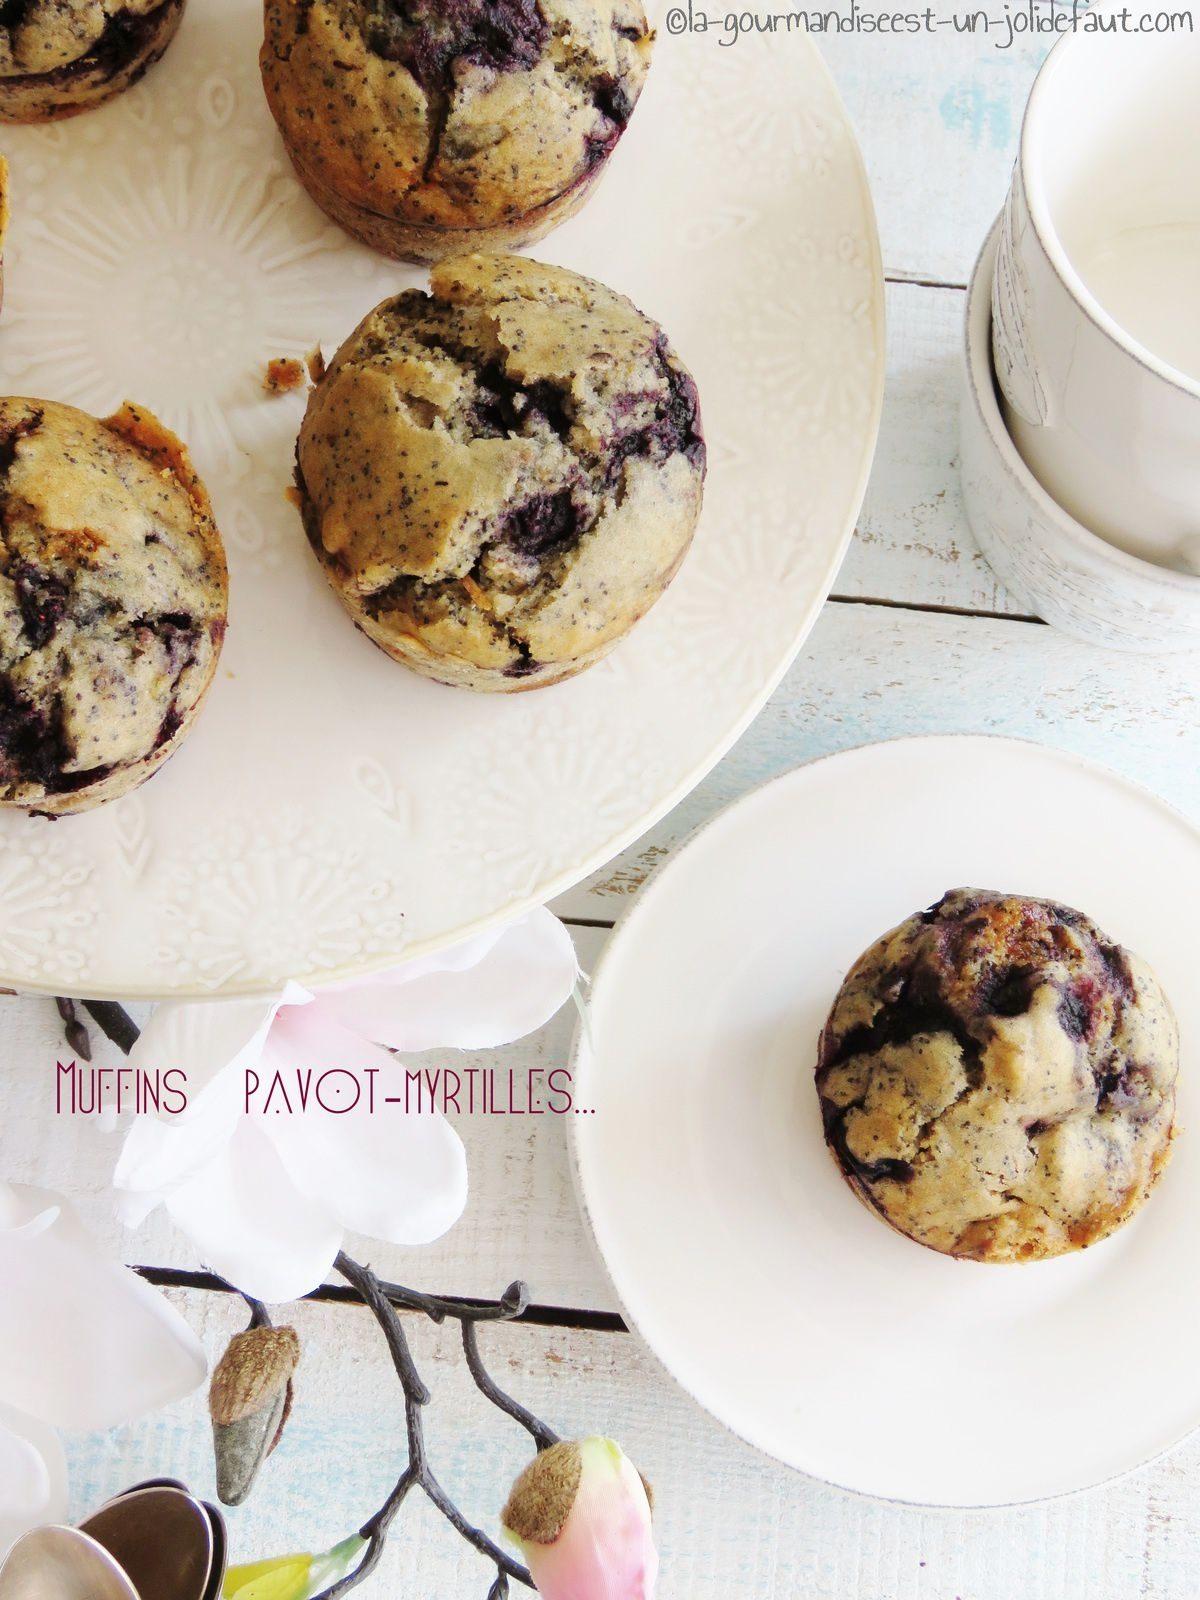 muffins pavot-myrtilles